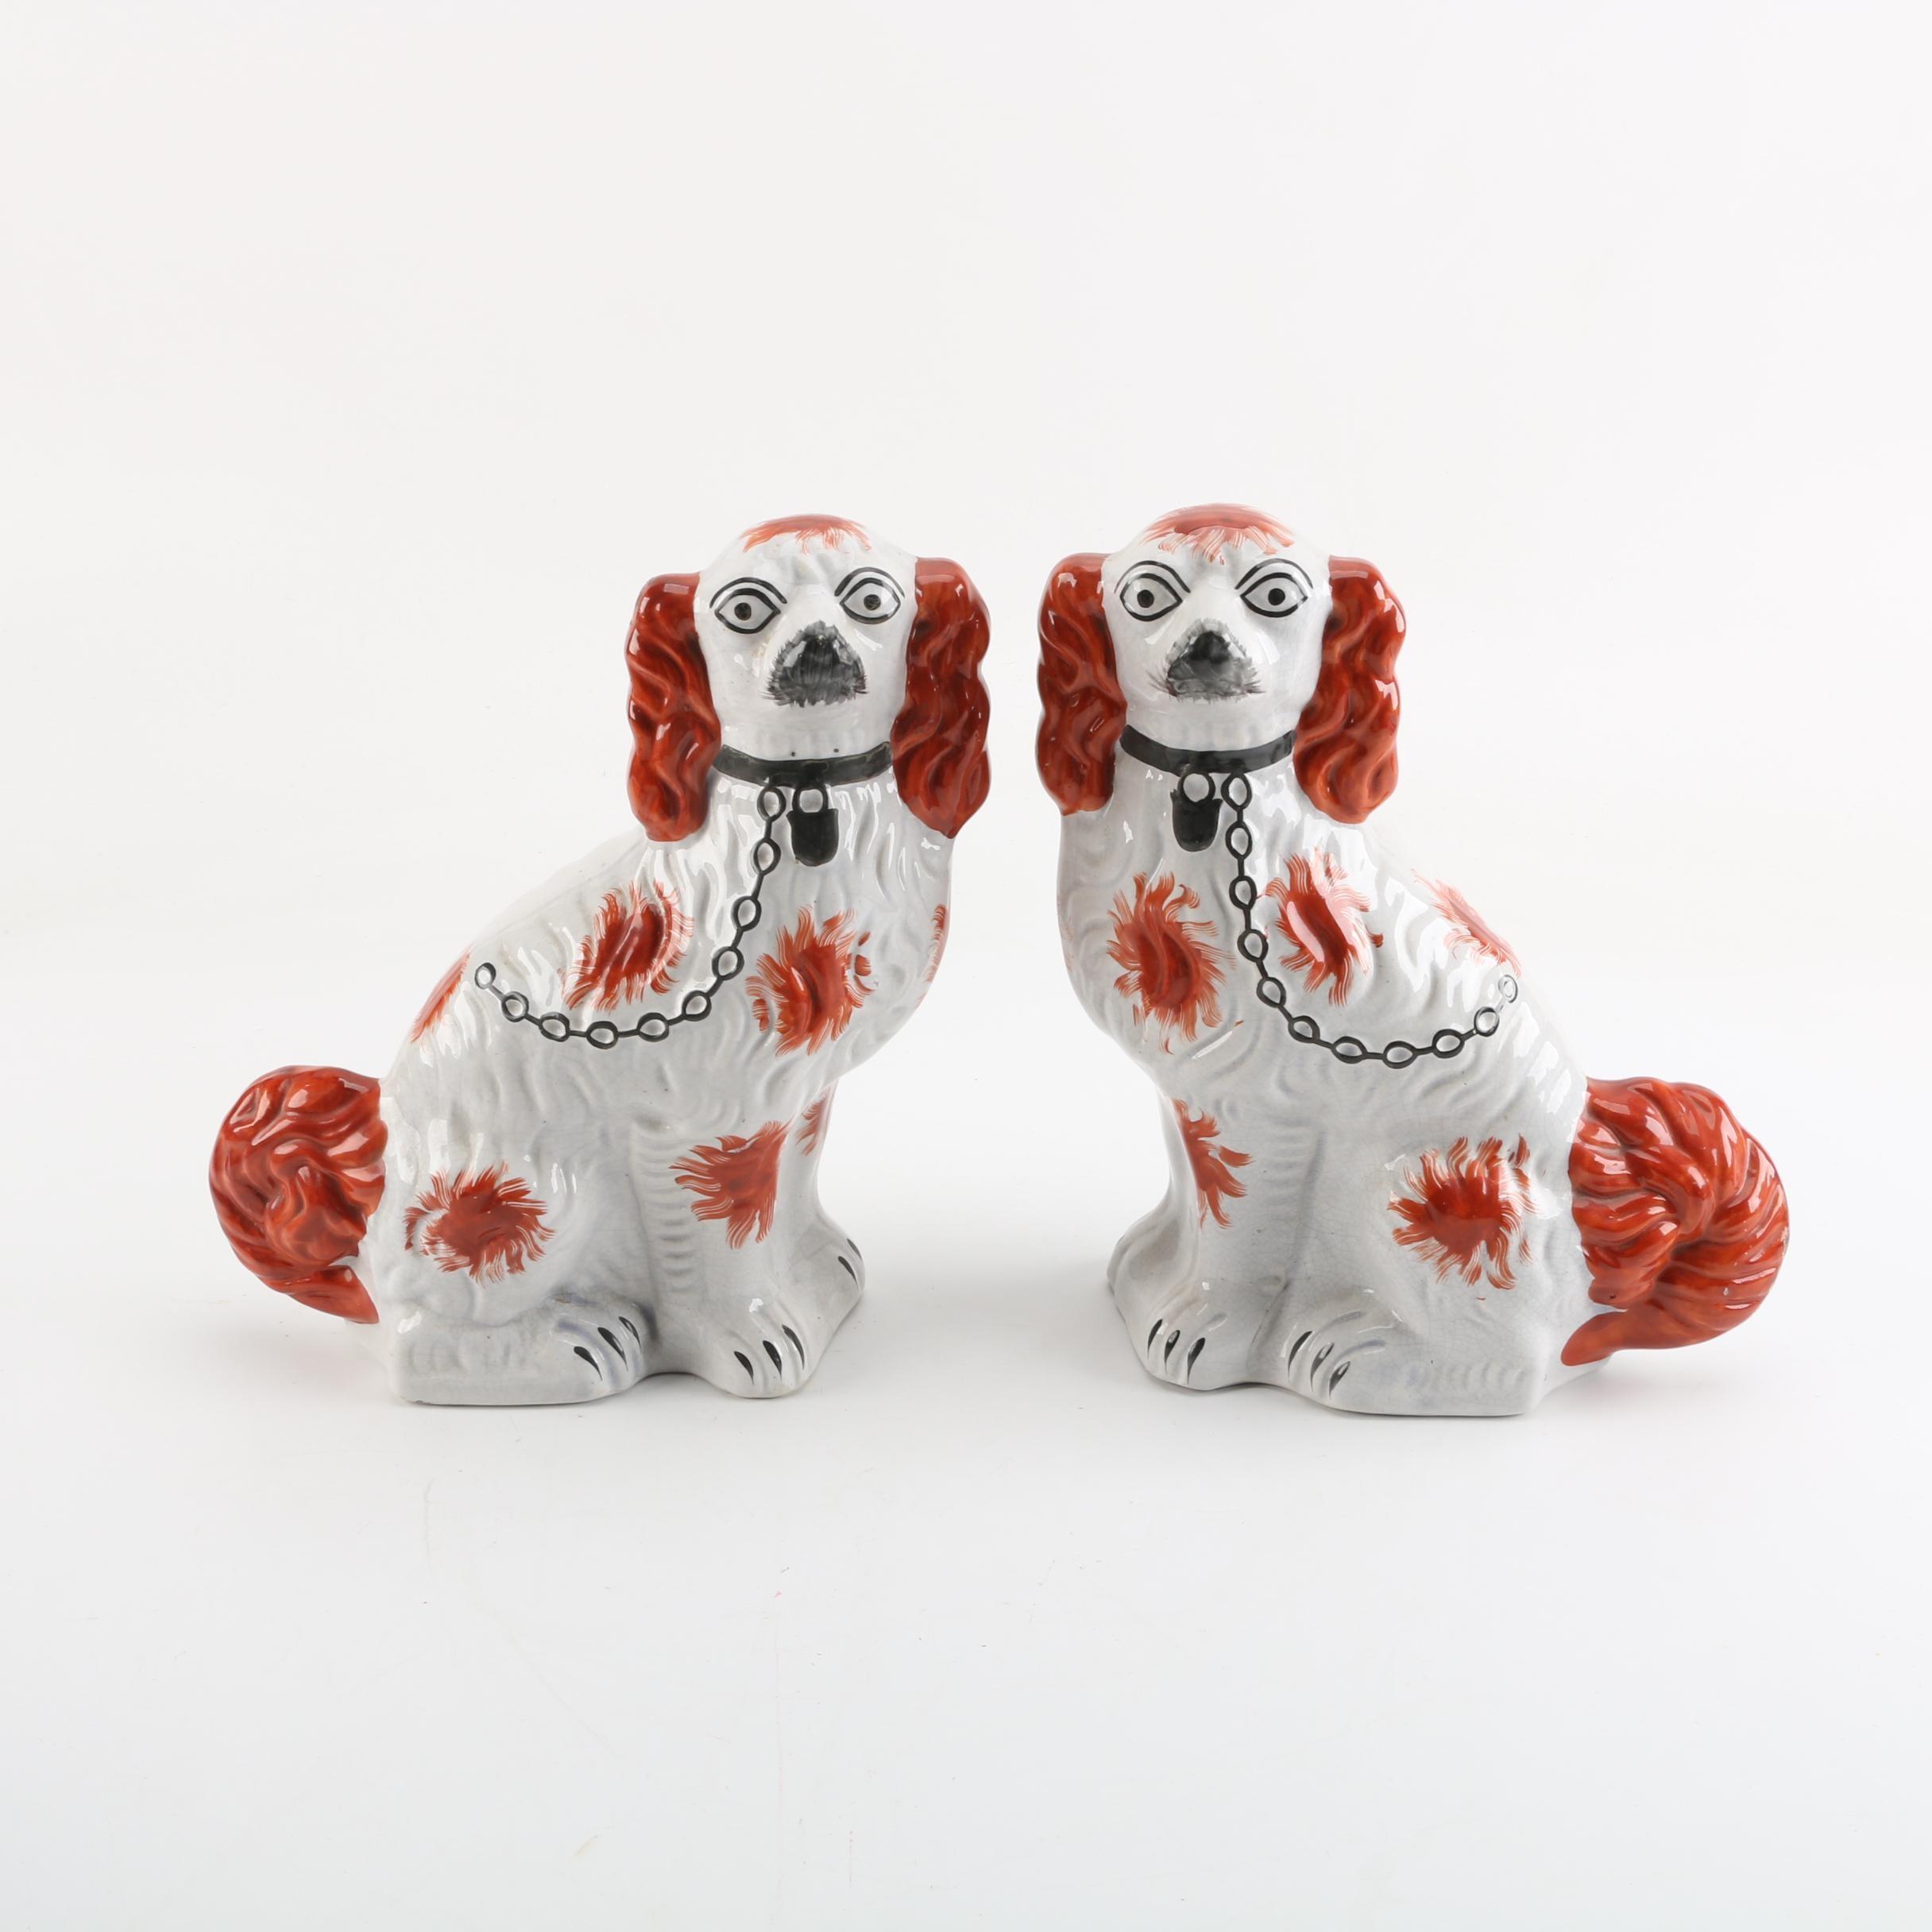 Ceramic Mirrored Spaniel Staffordshire Style Figurines